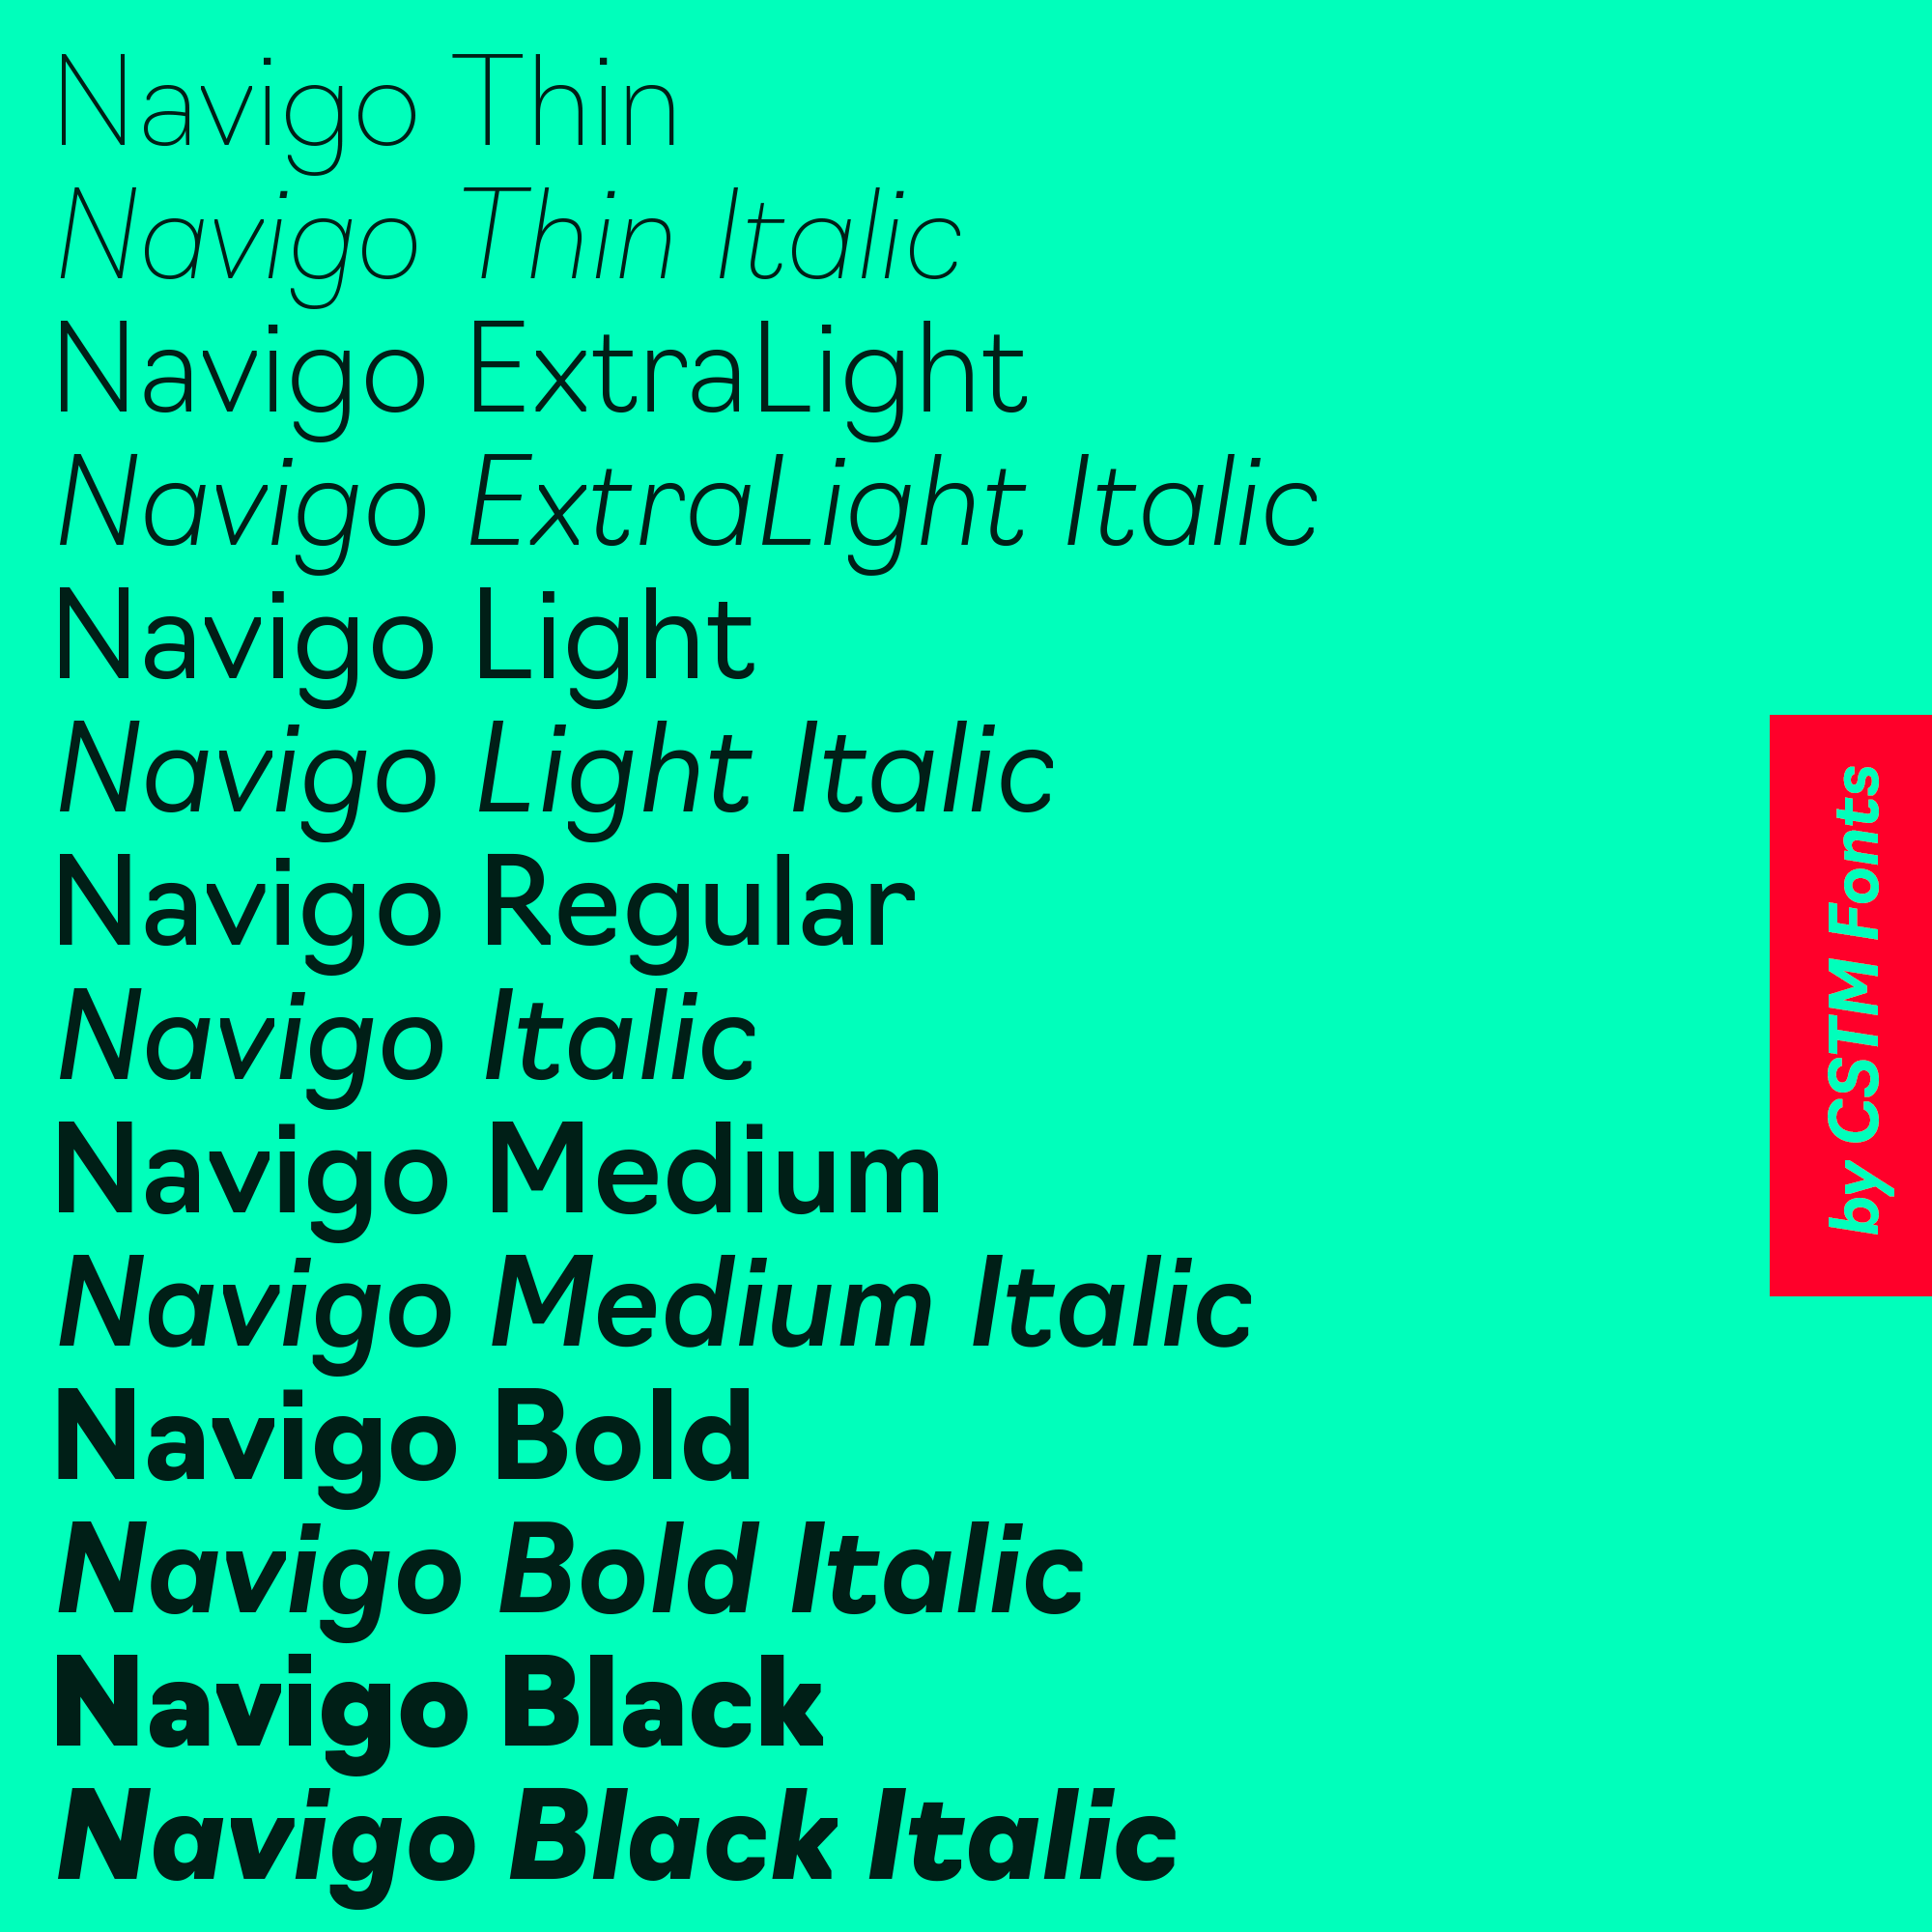 NavigoItalic_02